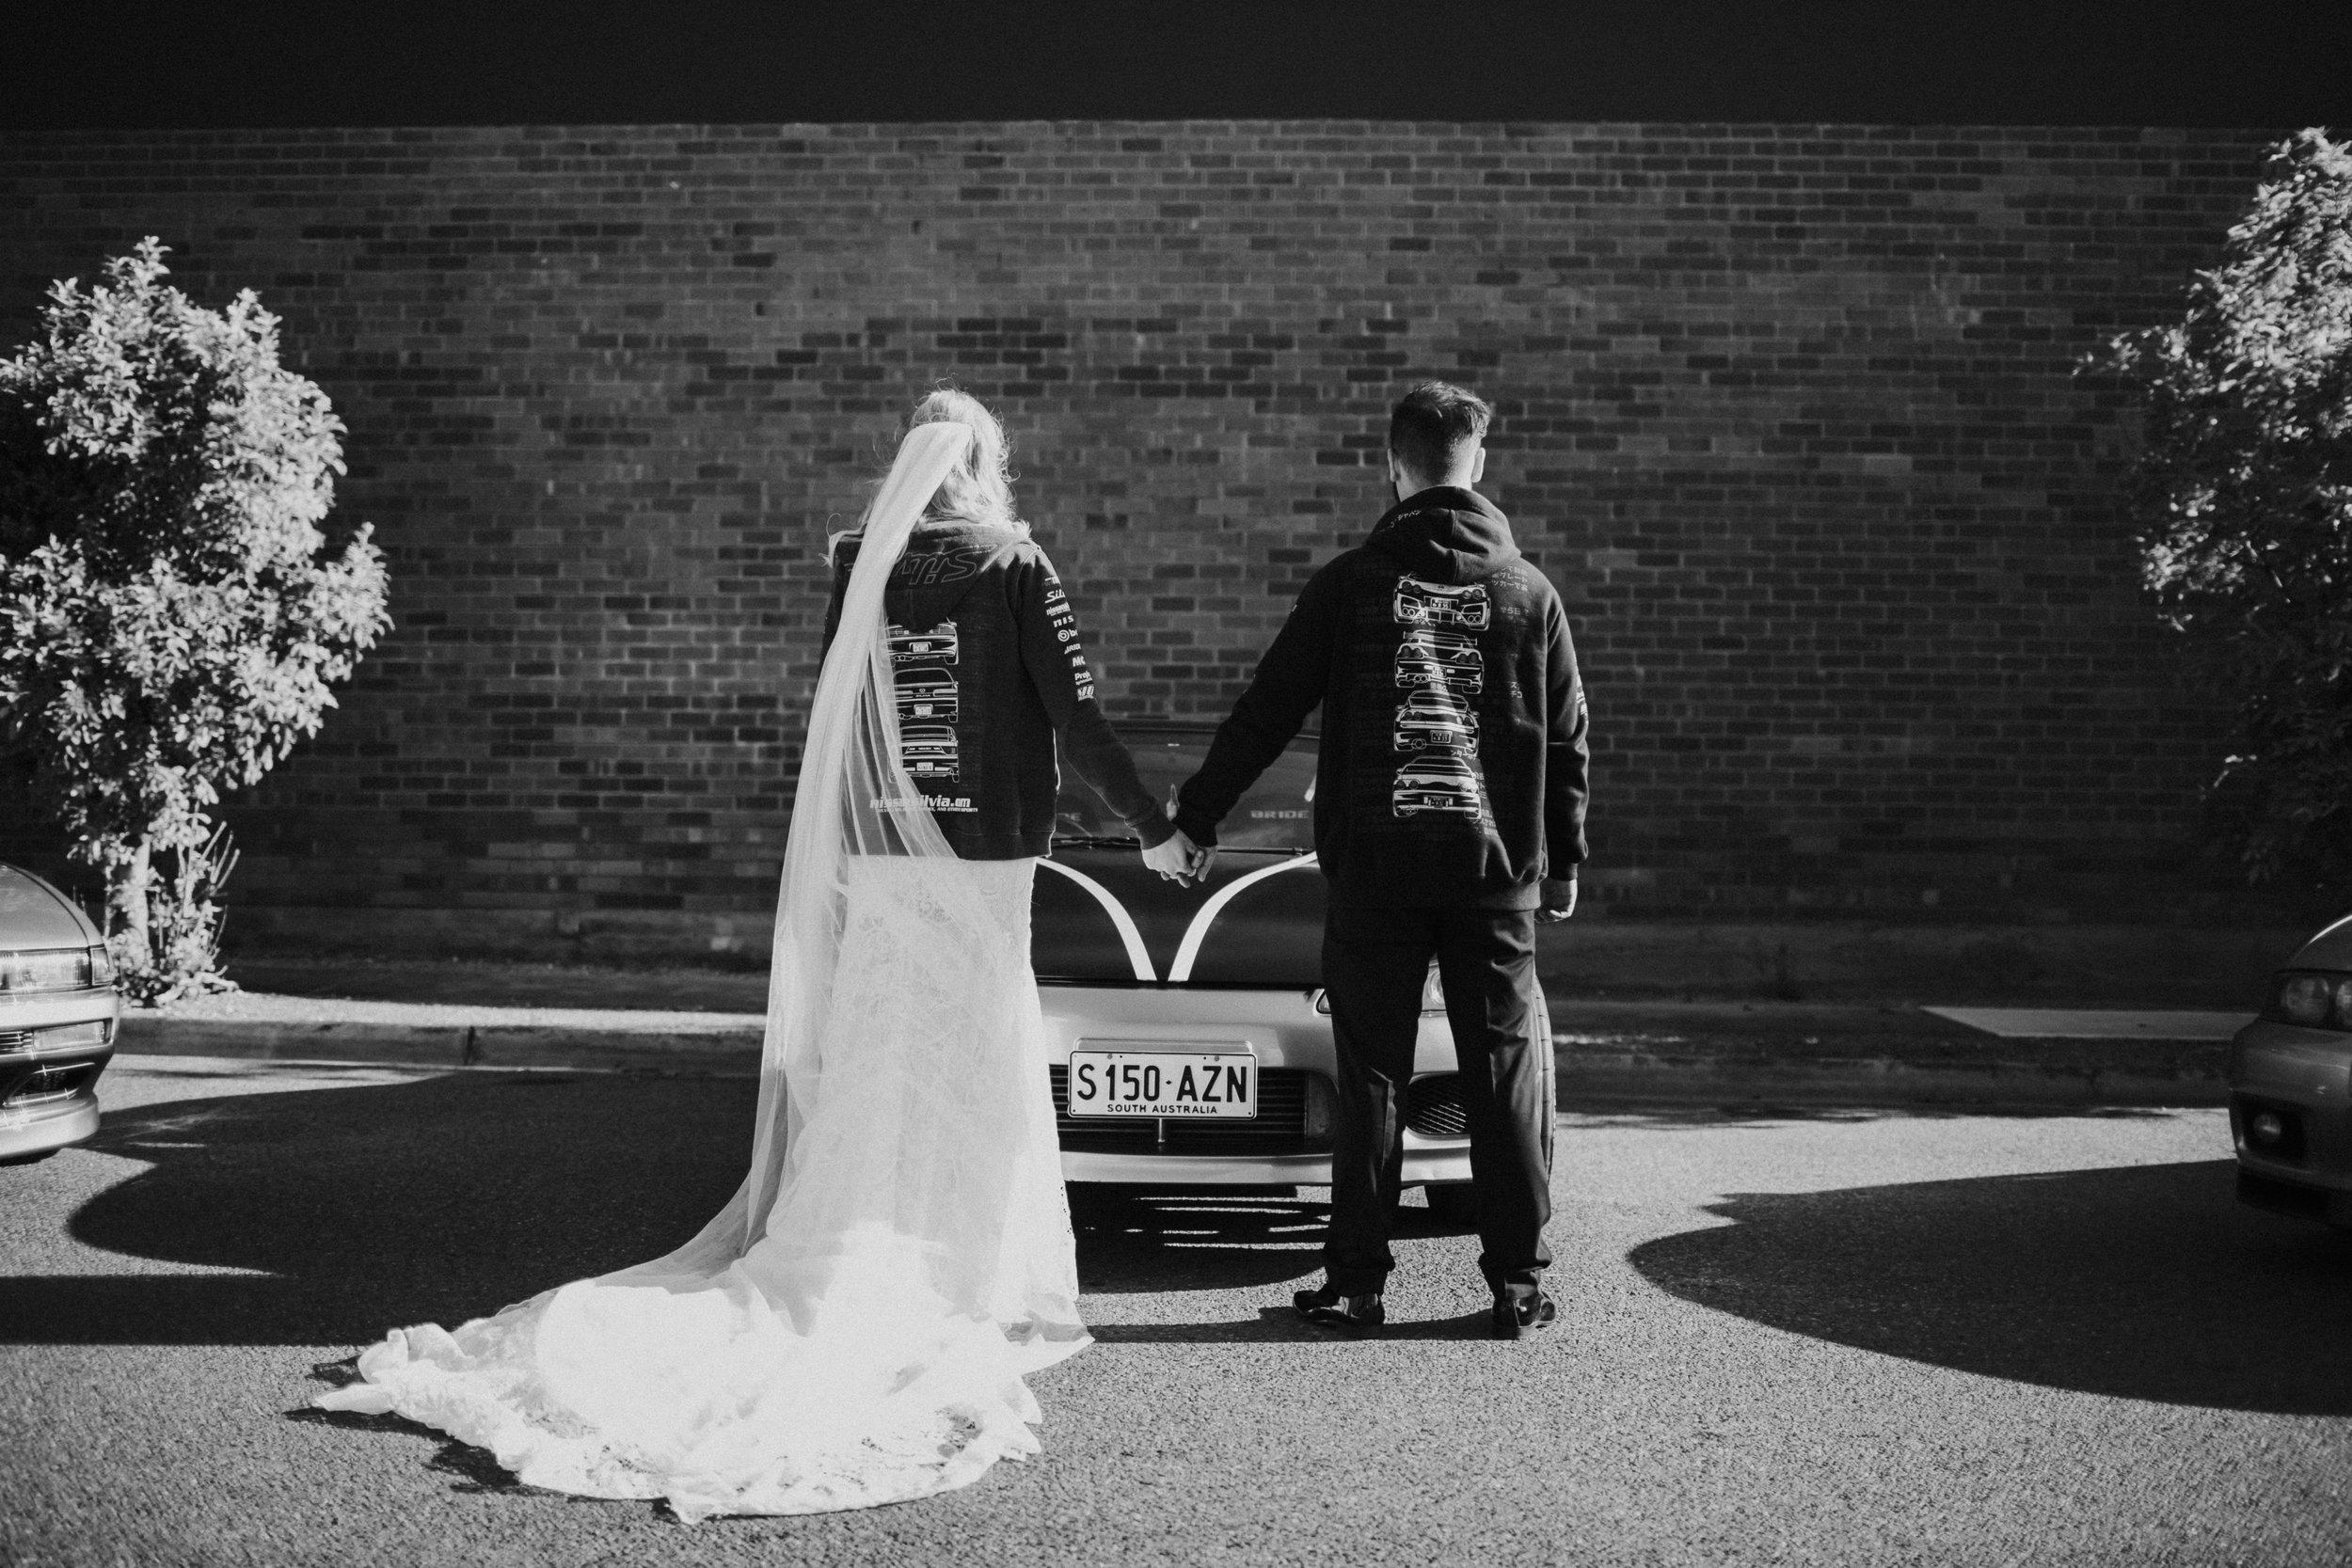 W.Travis-Benny-weddings-wedding-photographer-adelaide-Alia-Levi-1-784.jpg